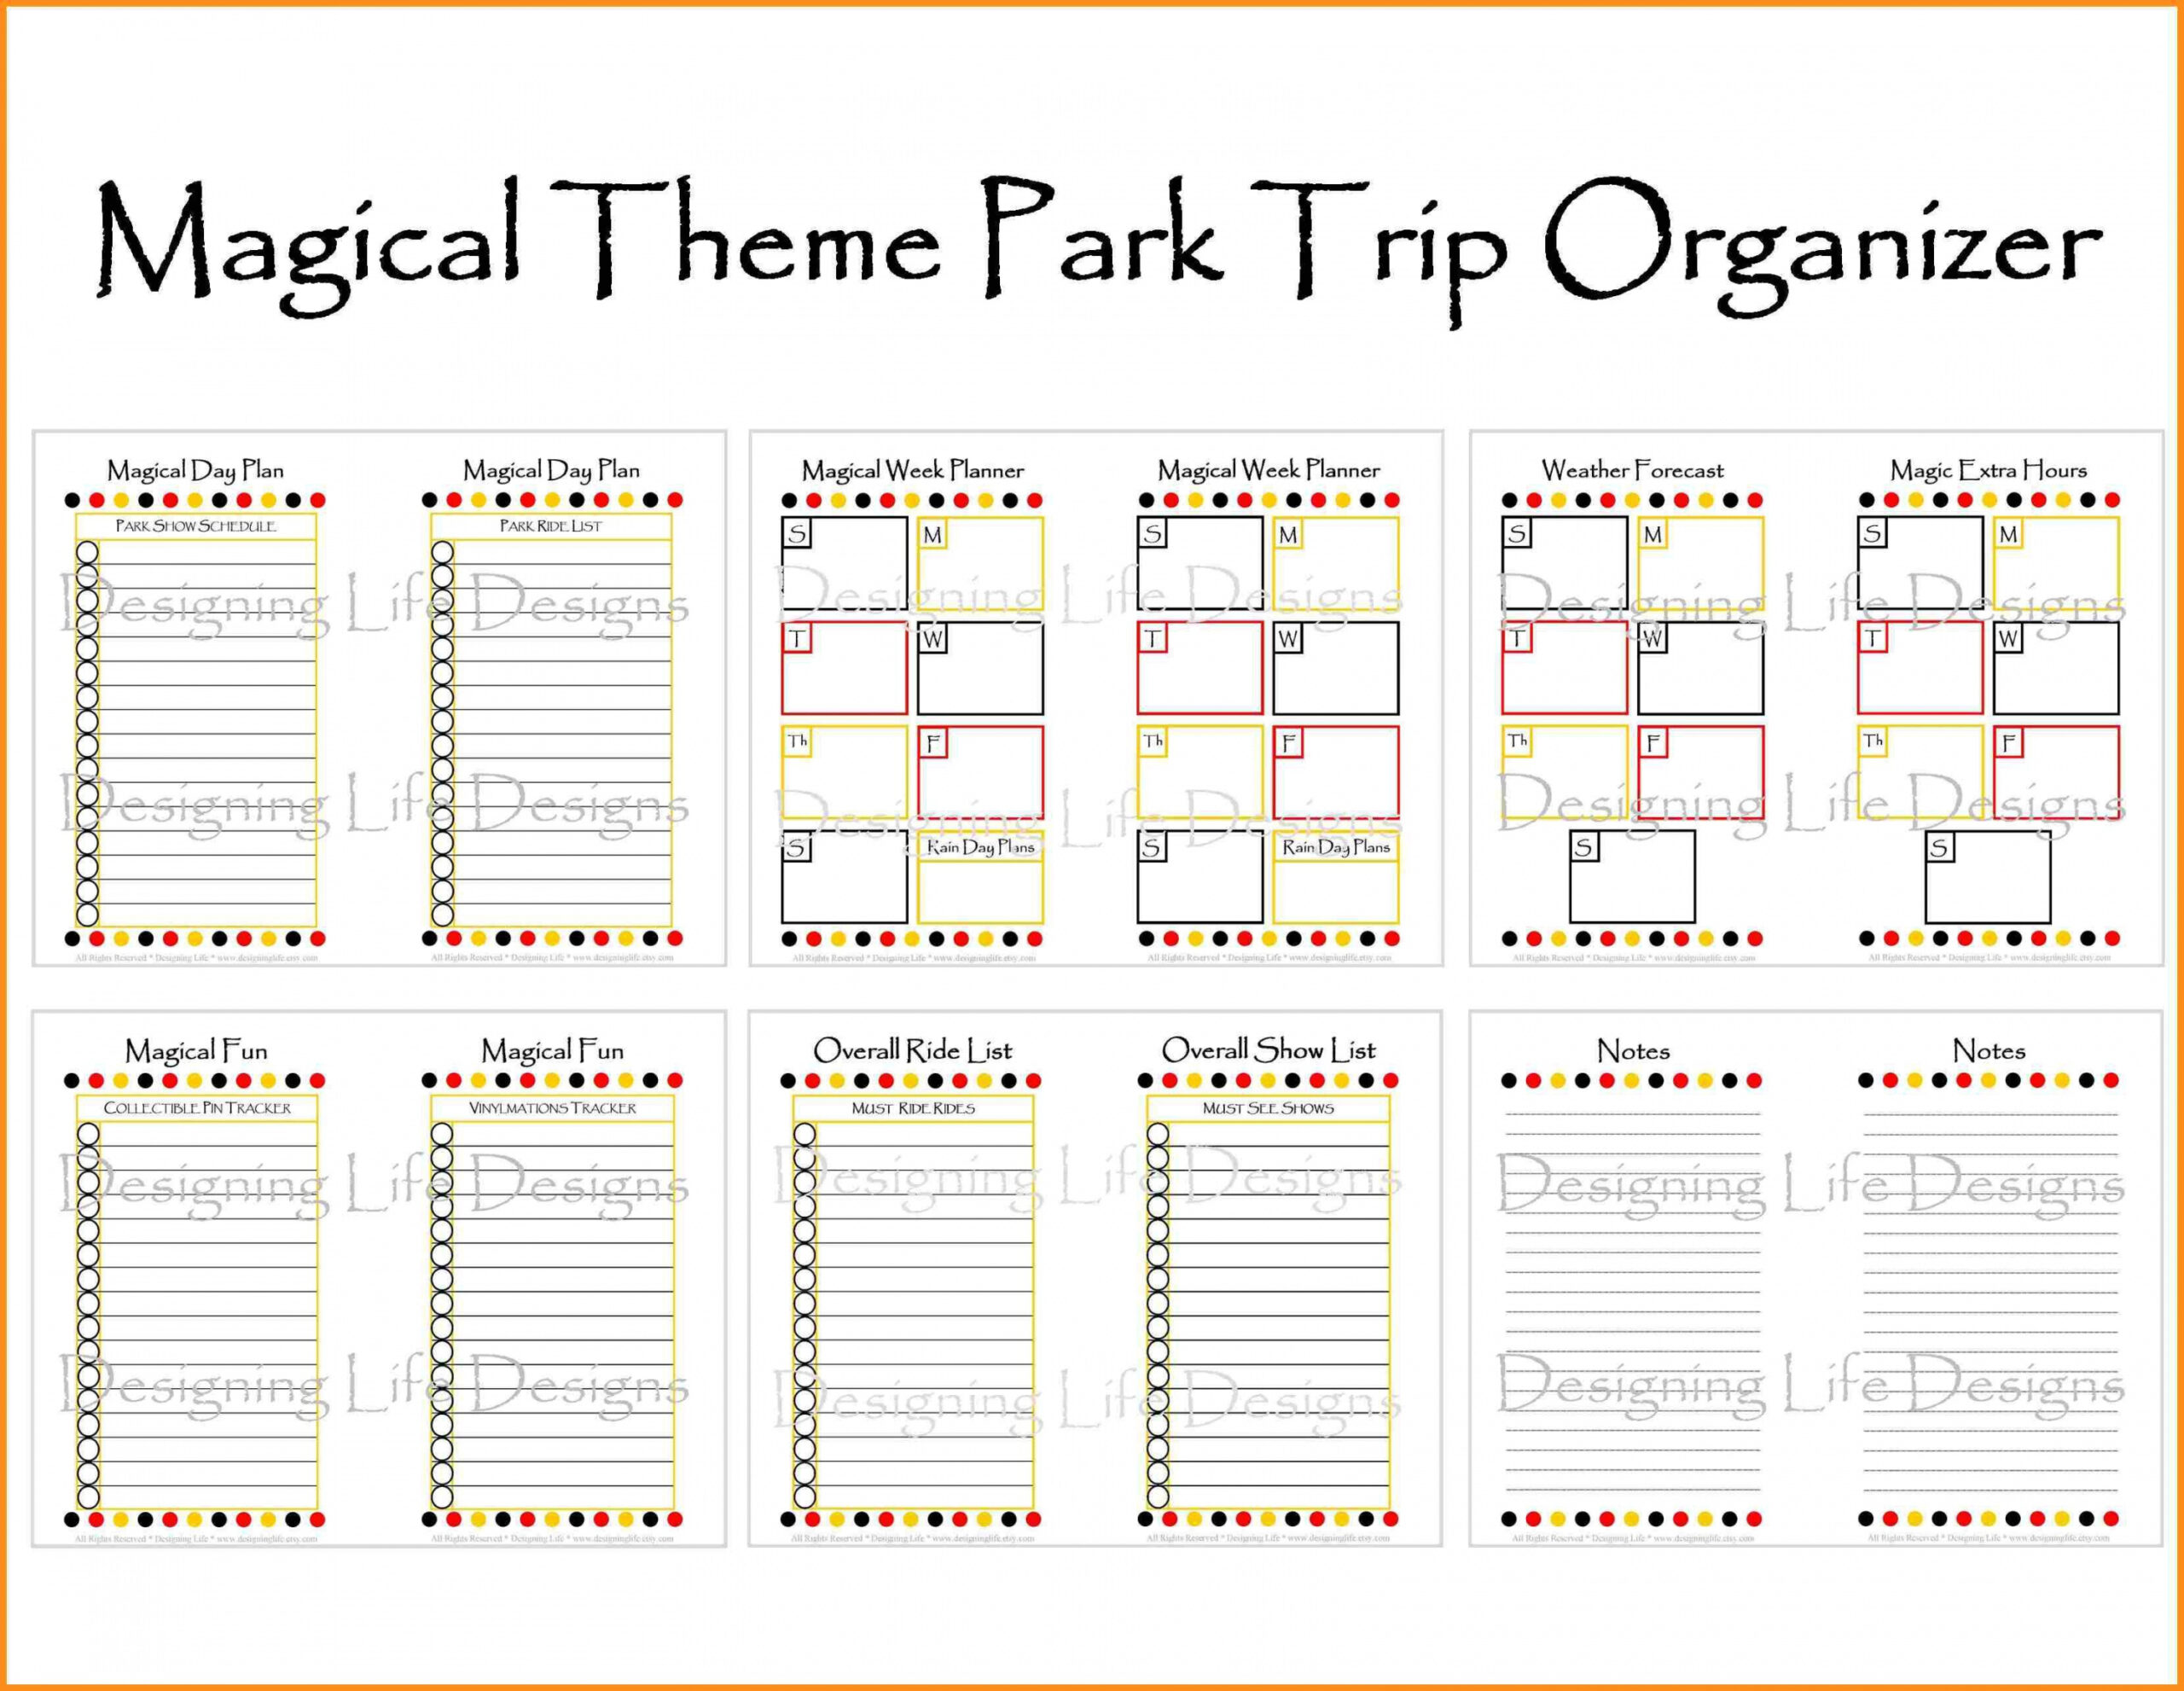 Disney World Vacation Planner Templates | Example Calendar